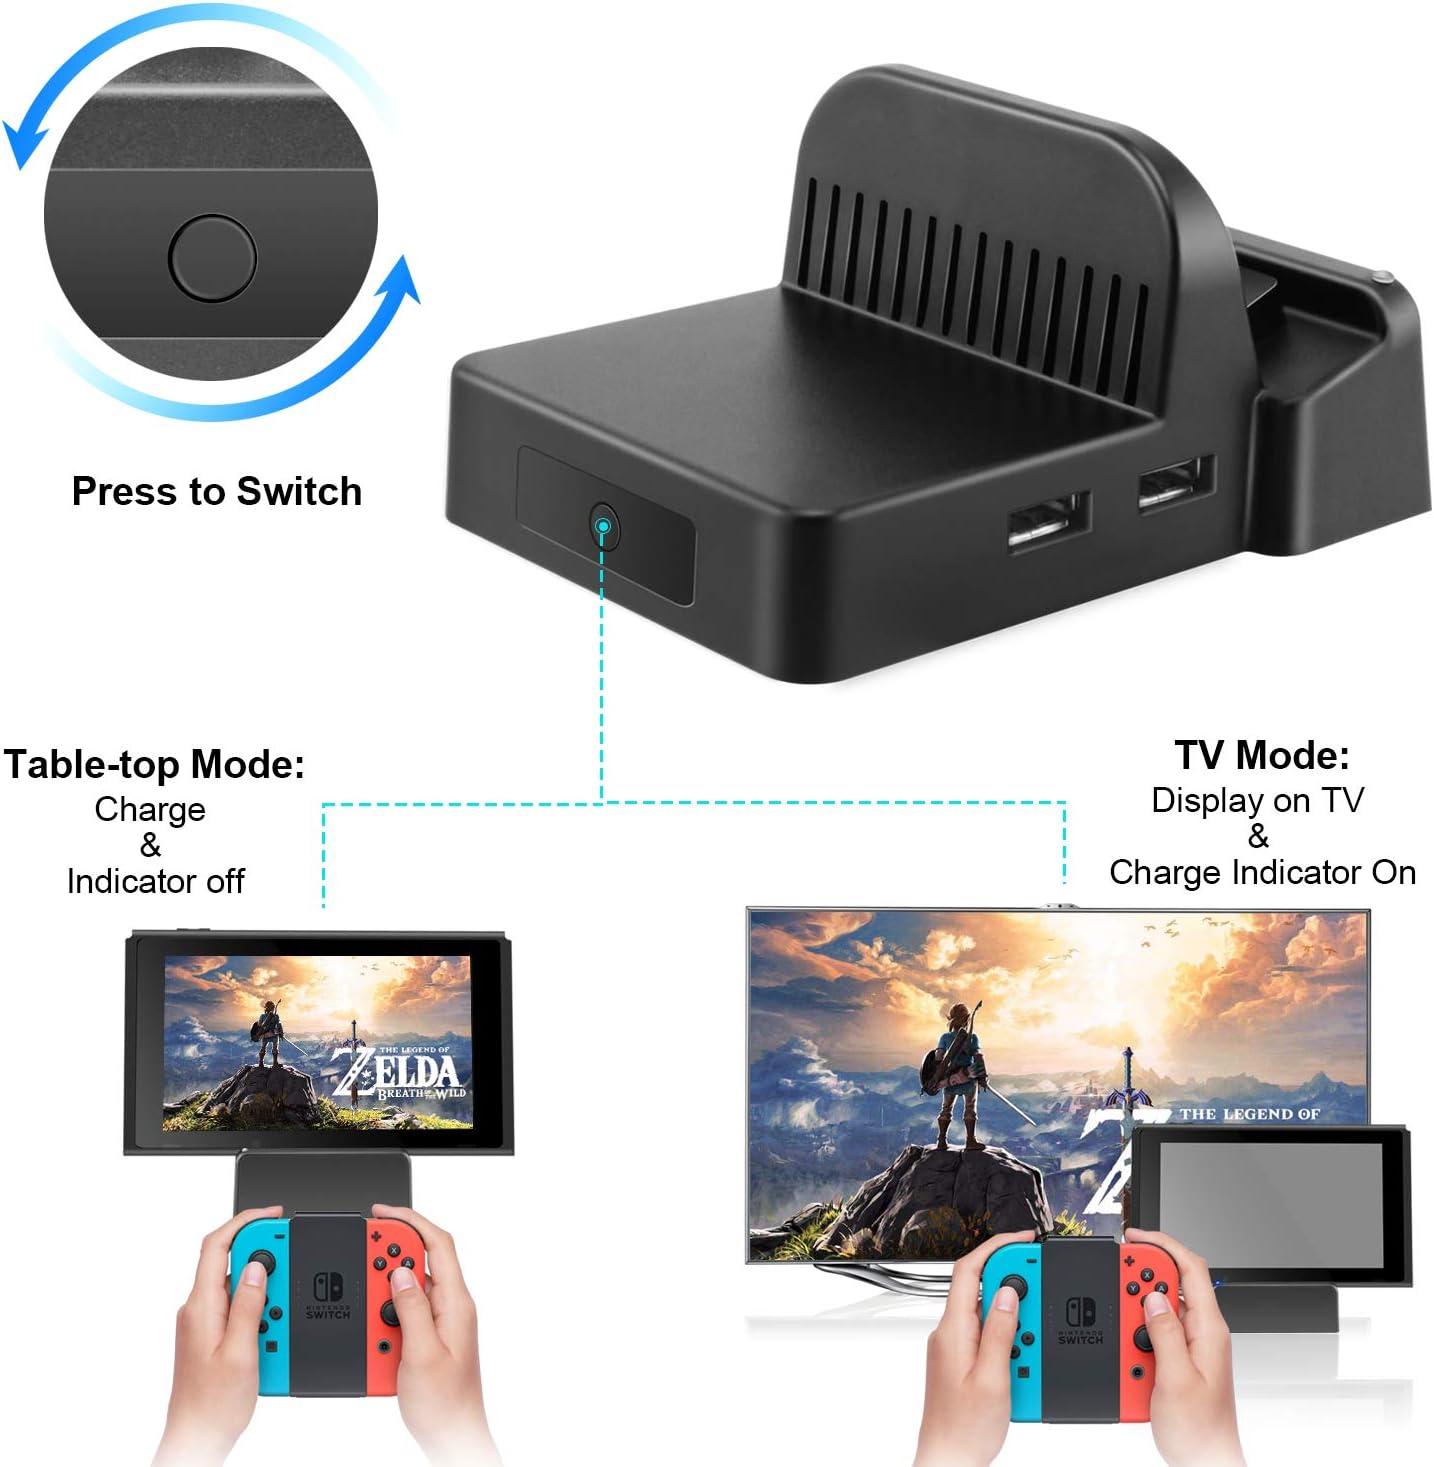 Ponkor Base de Carga para Nintendo Switch, Mini Switch TV Dock Soporte de Carga, Protable Adaptador HDMI Reemplazo de Carga para Nintendo Switch con USB 3.0 LED Light: Amazon.es: Videojuegos